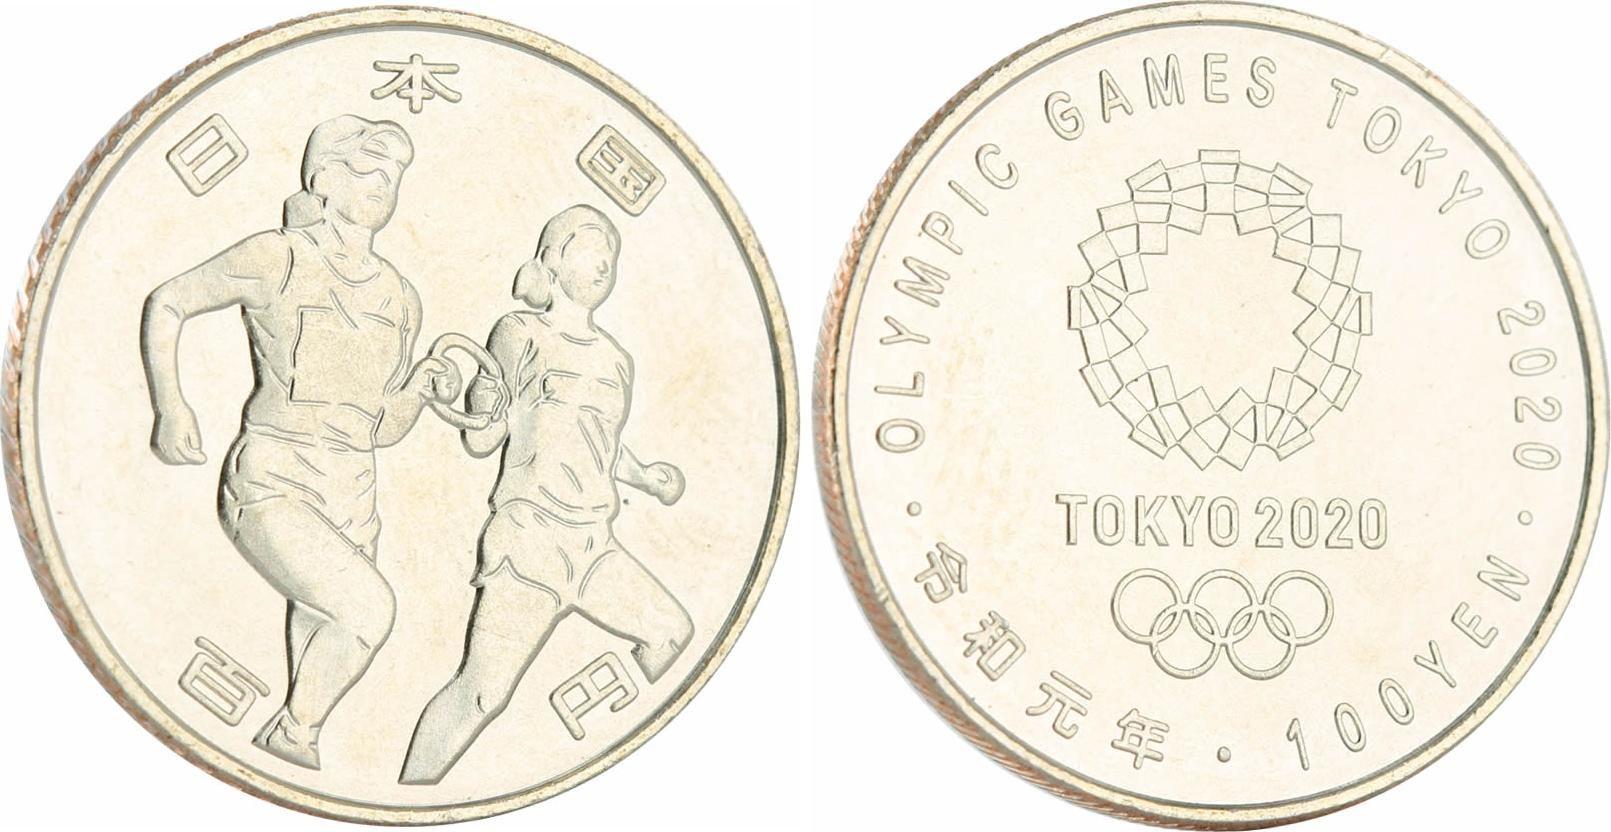 Japon 100 Yen, Athlétisme - JO TOKYO 2020 - SPL